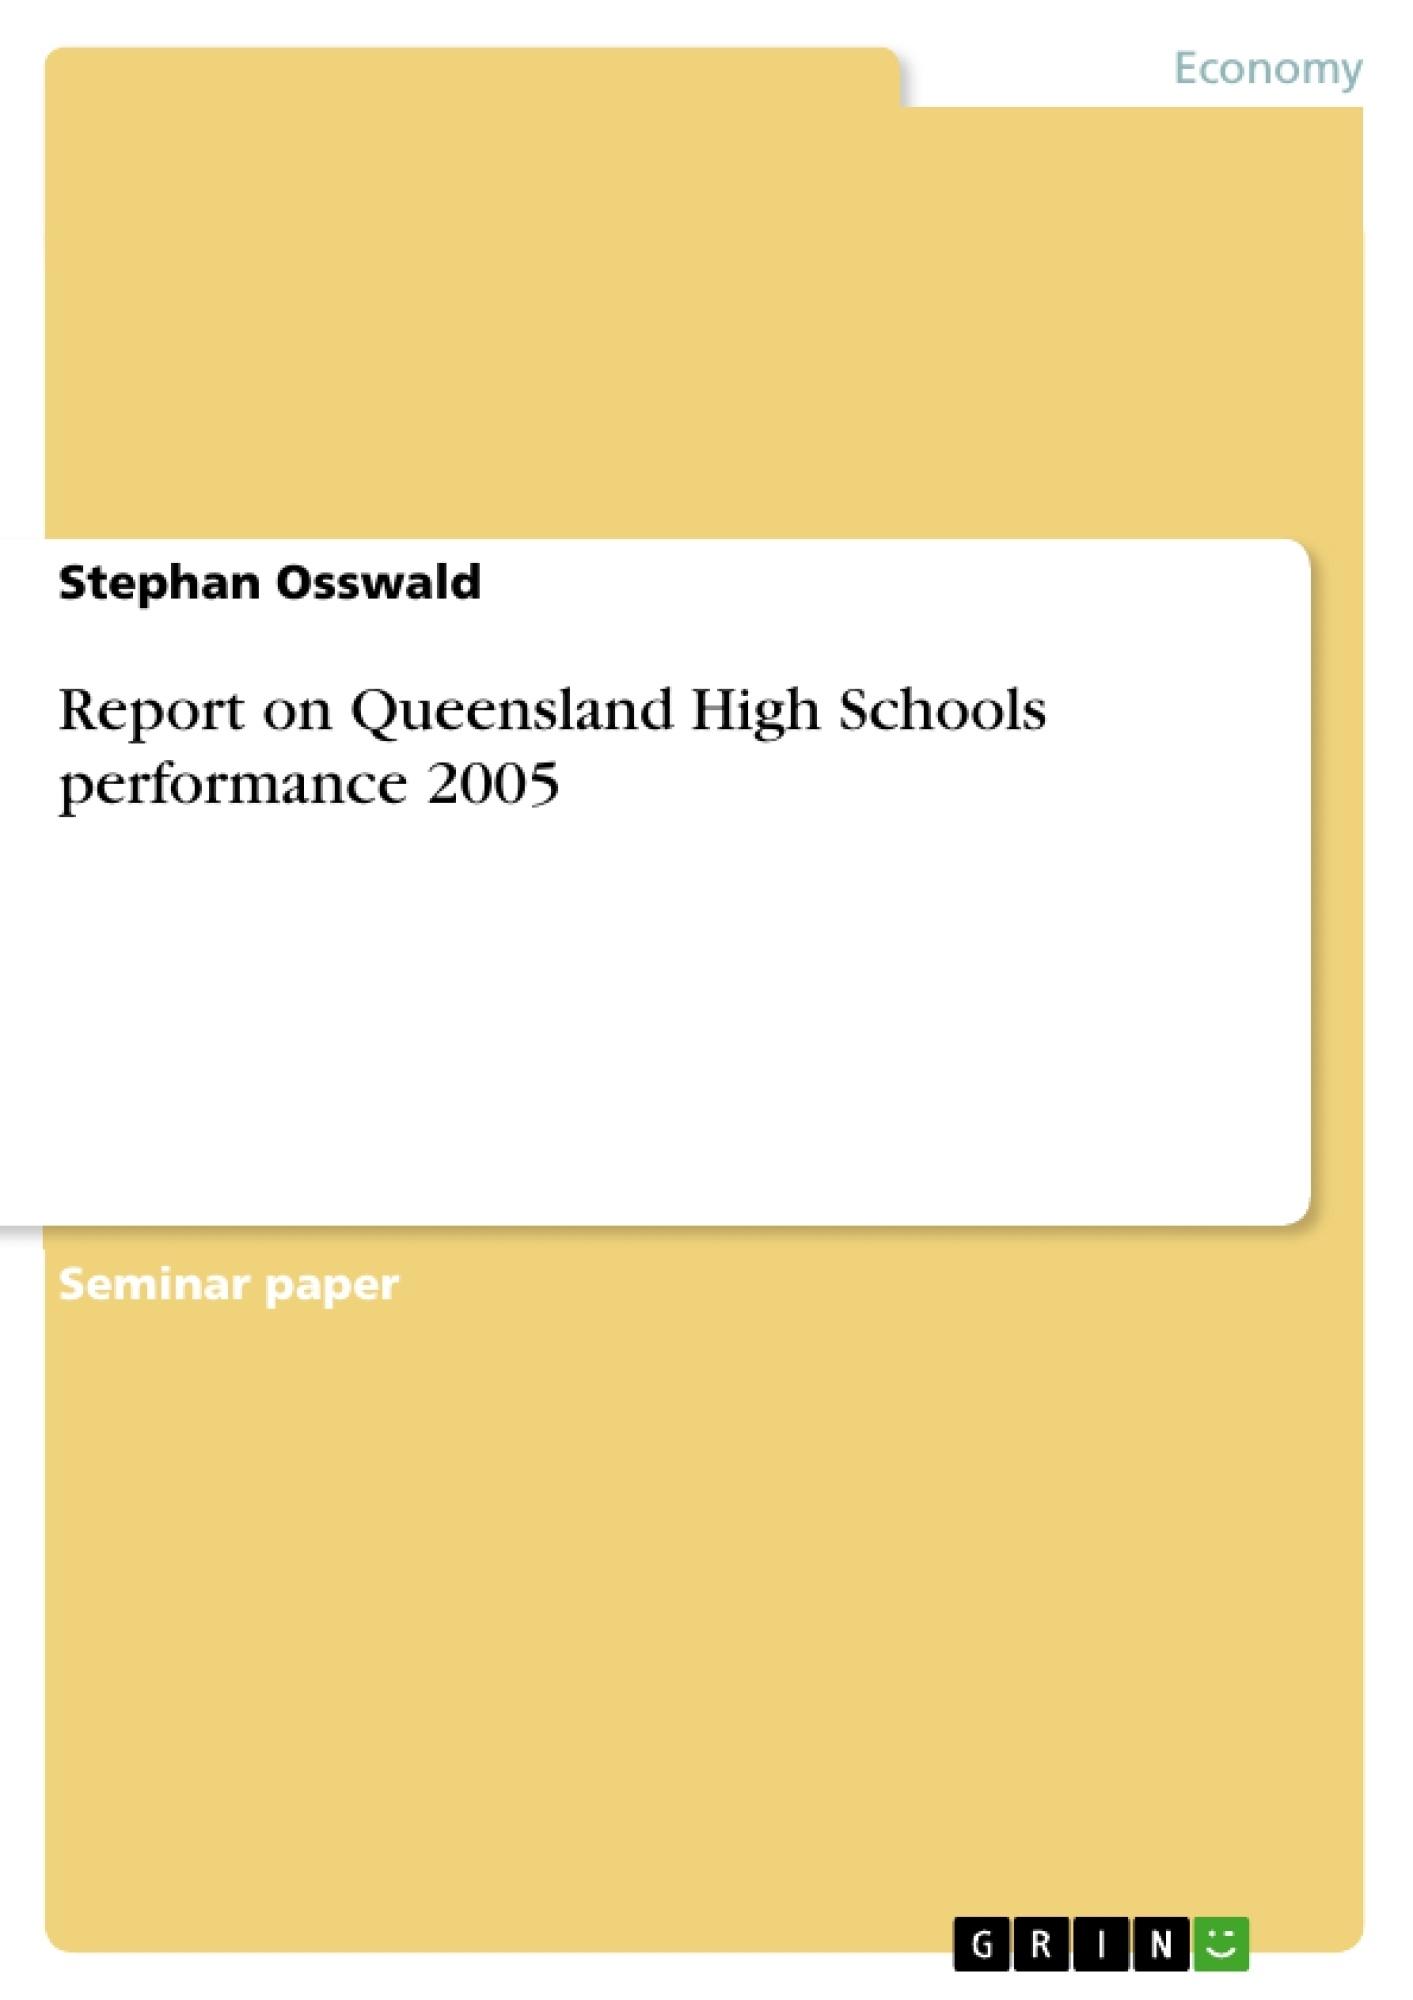 Title: Report on Queensland High Schools performance 2005